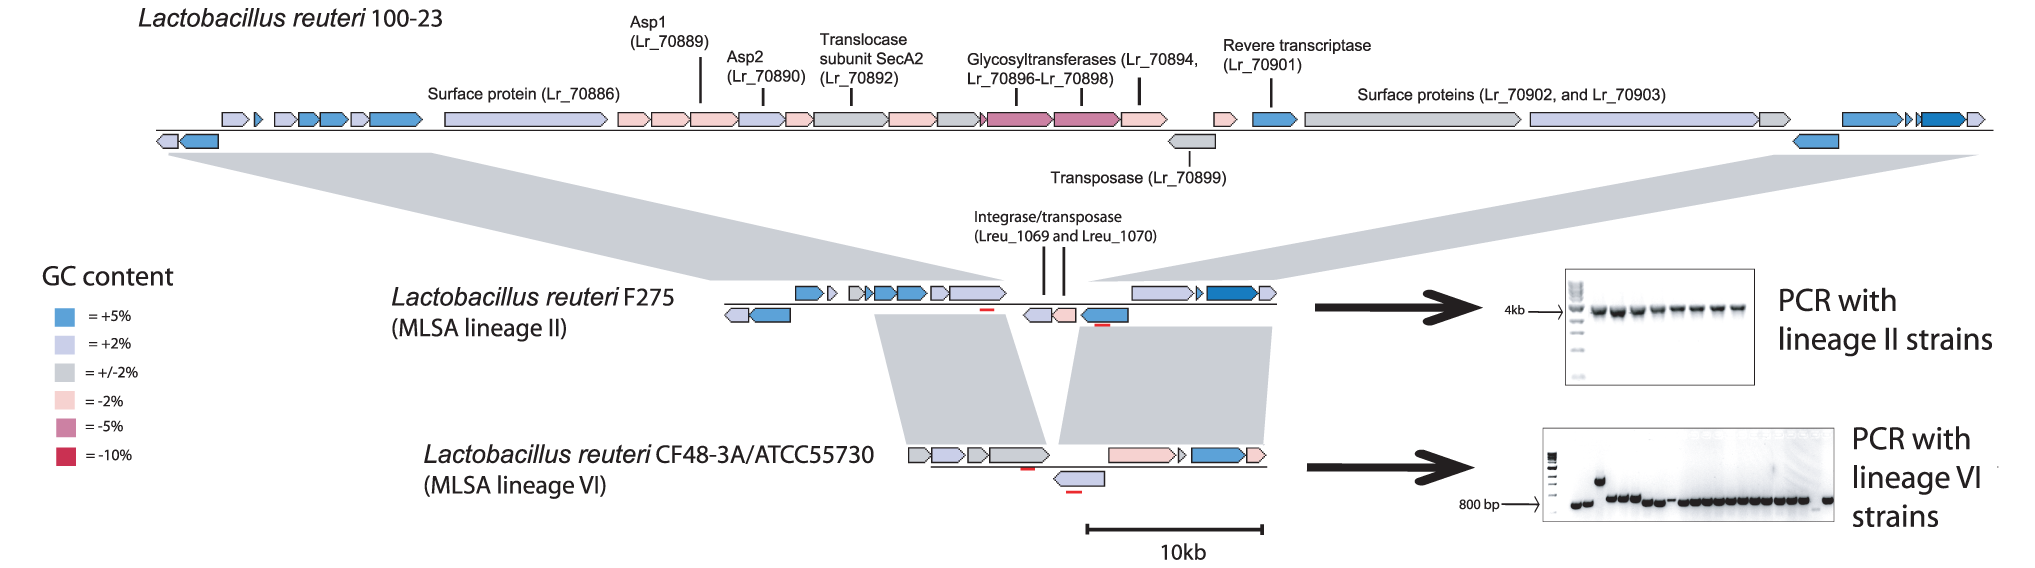 Comparison of the genomic location that contains the accessory SecA2 cluster in <i>L. reuteri</i> 100-23.